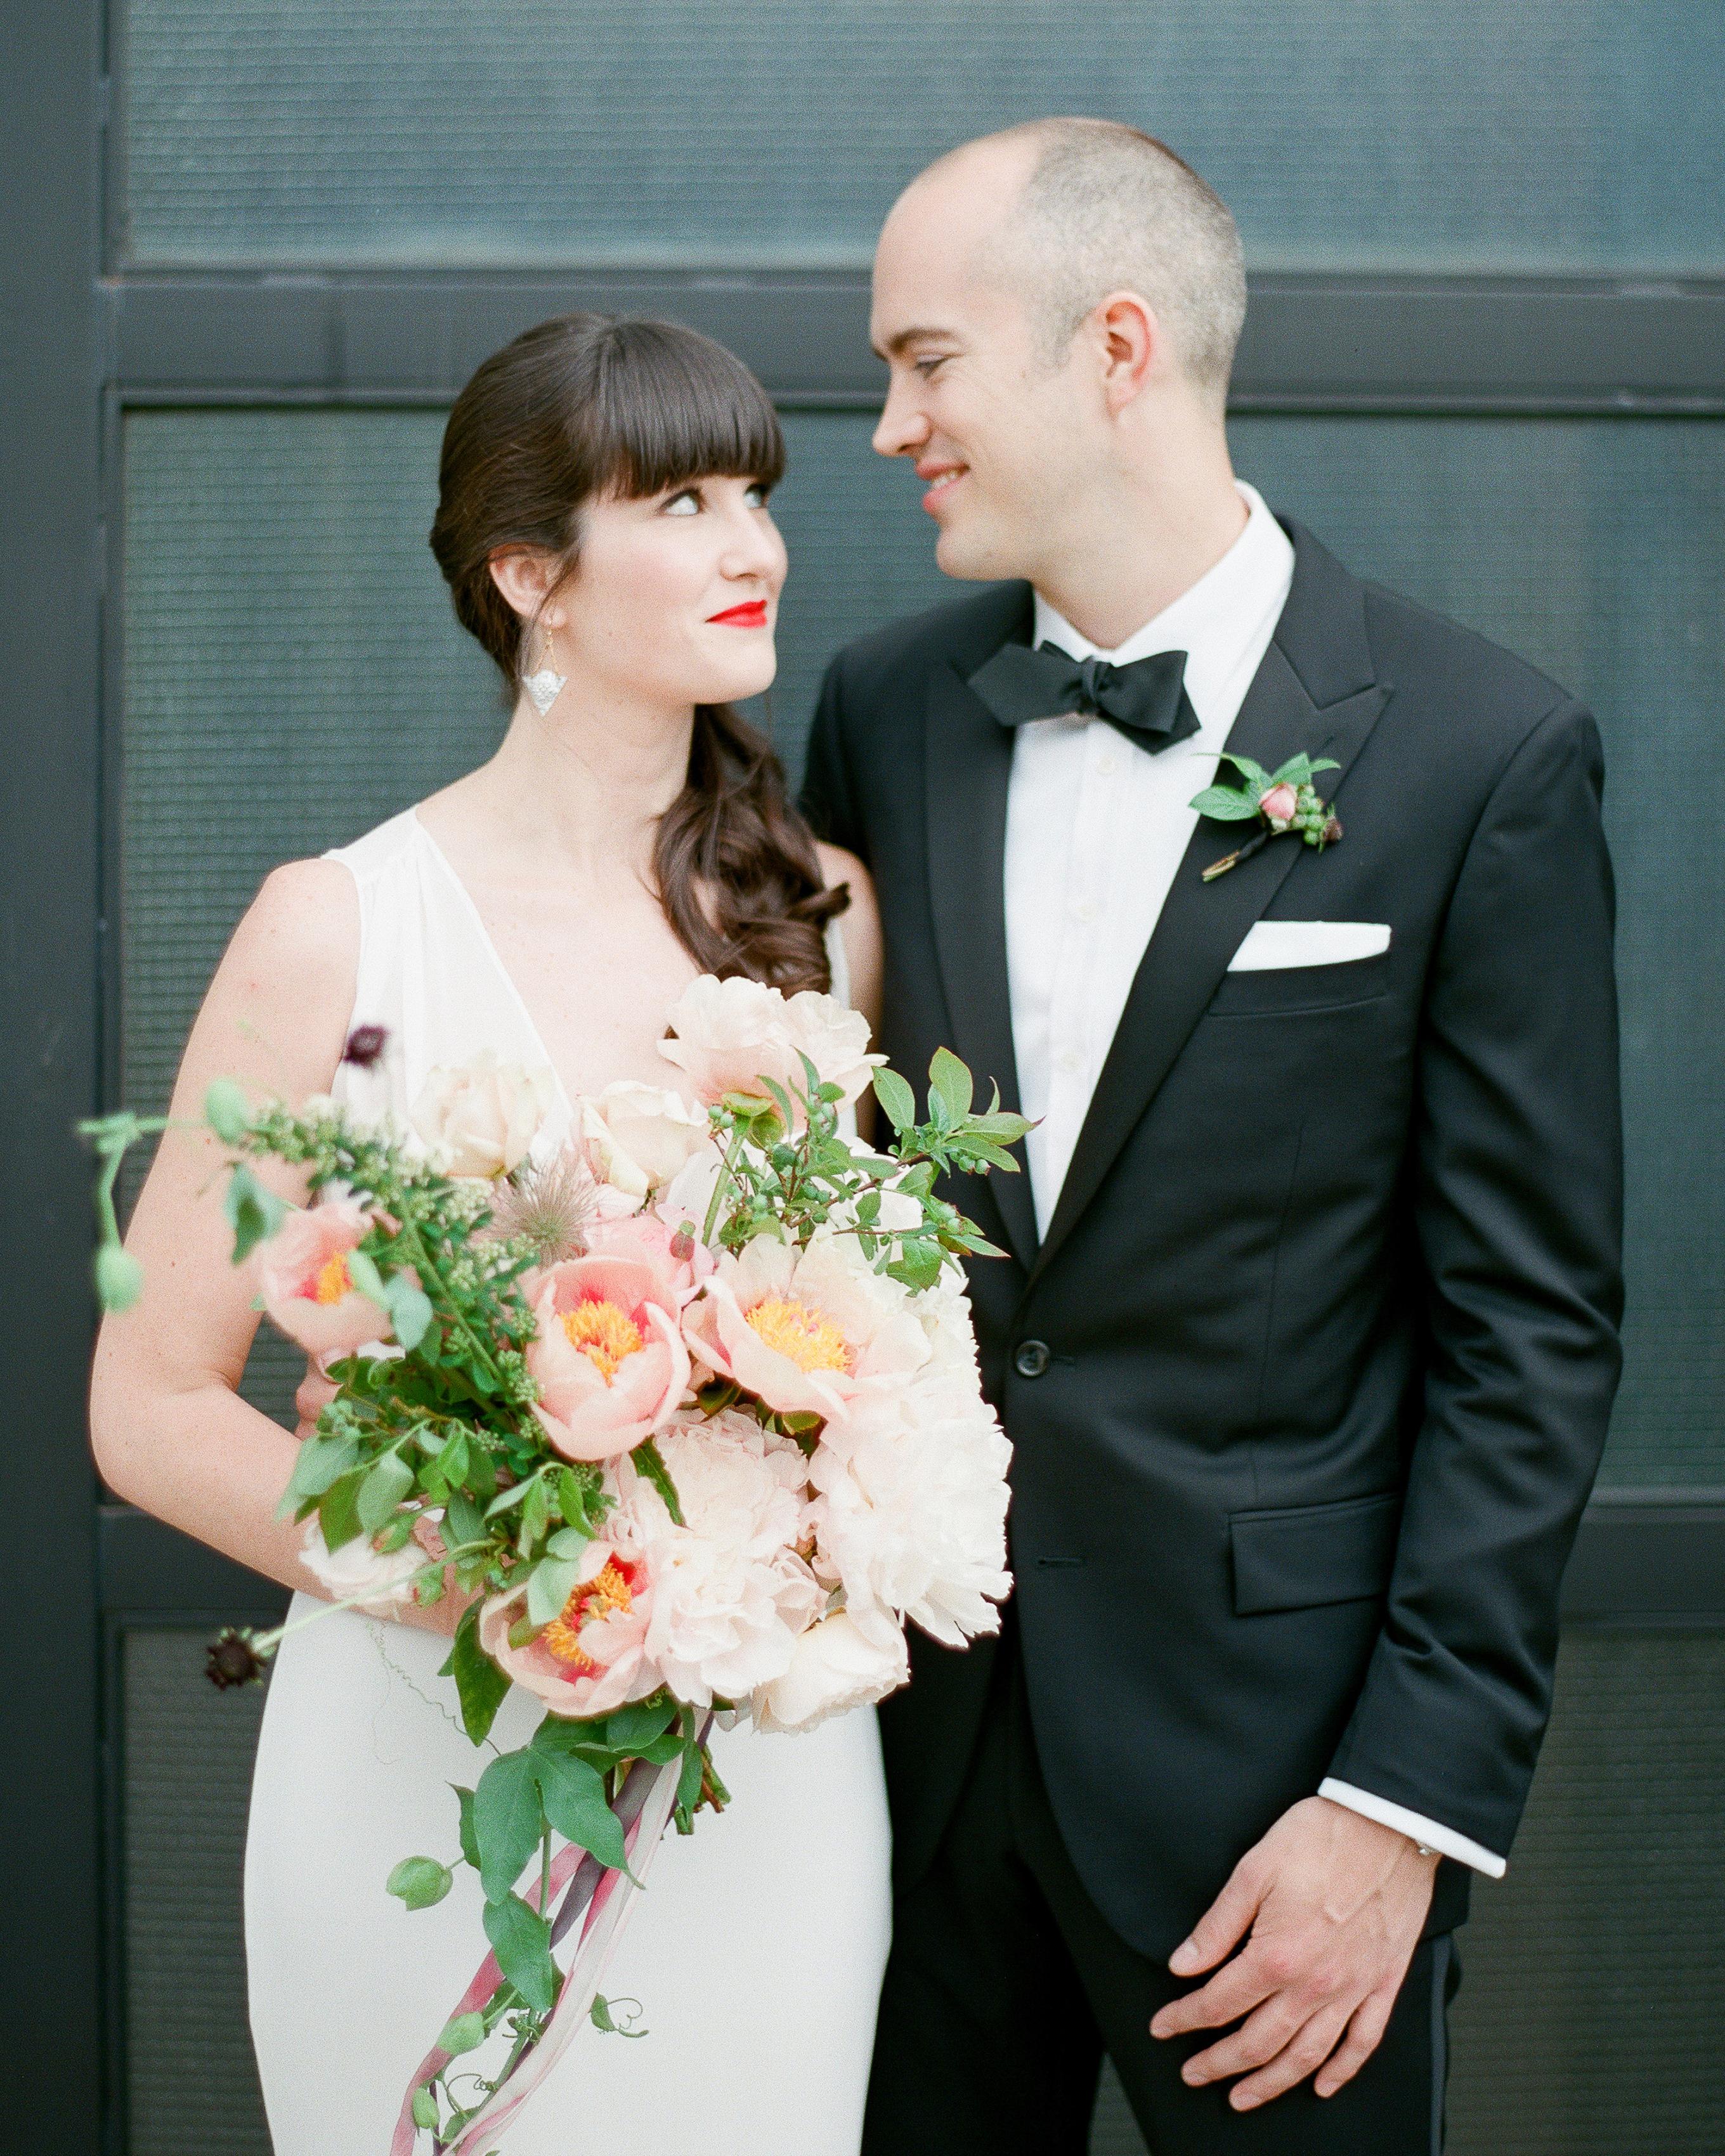 ashley-jonathon-wedding-couple-22-s111483-0914.jpg